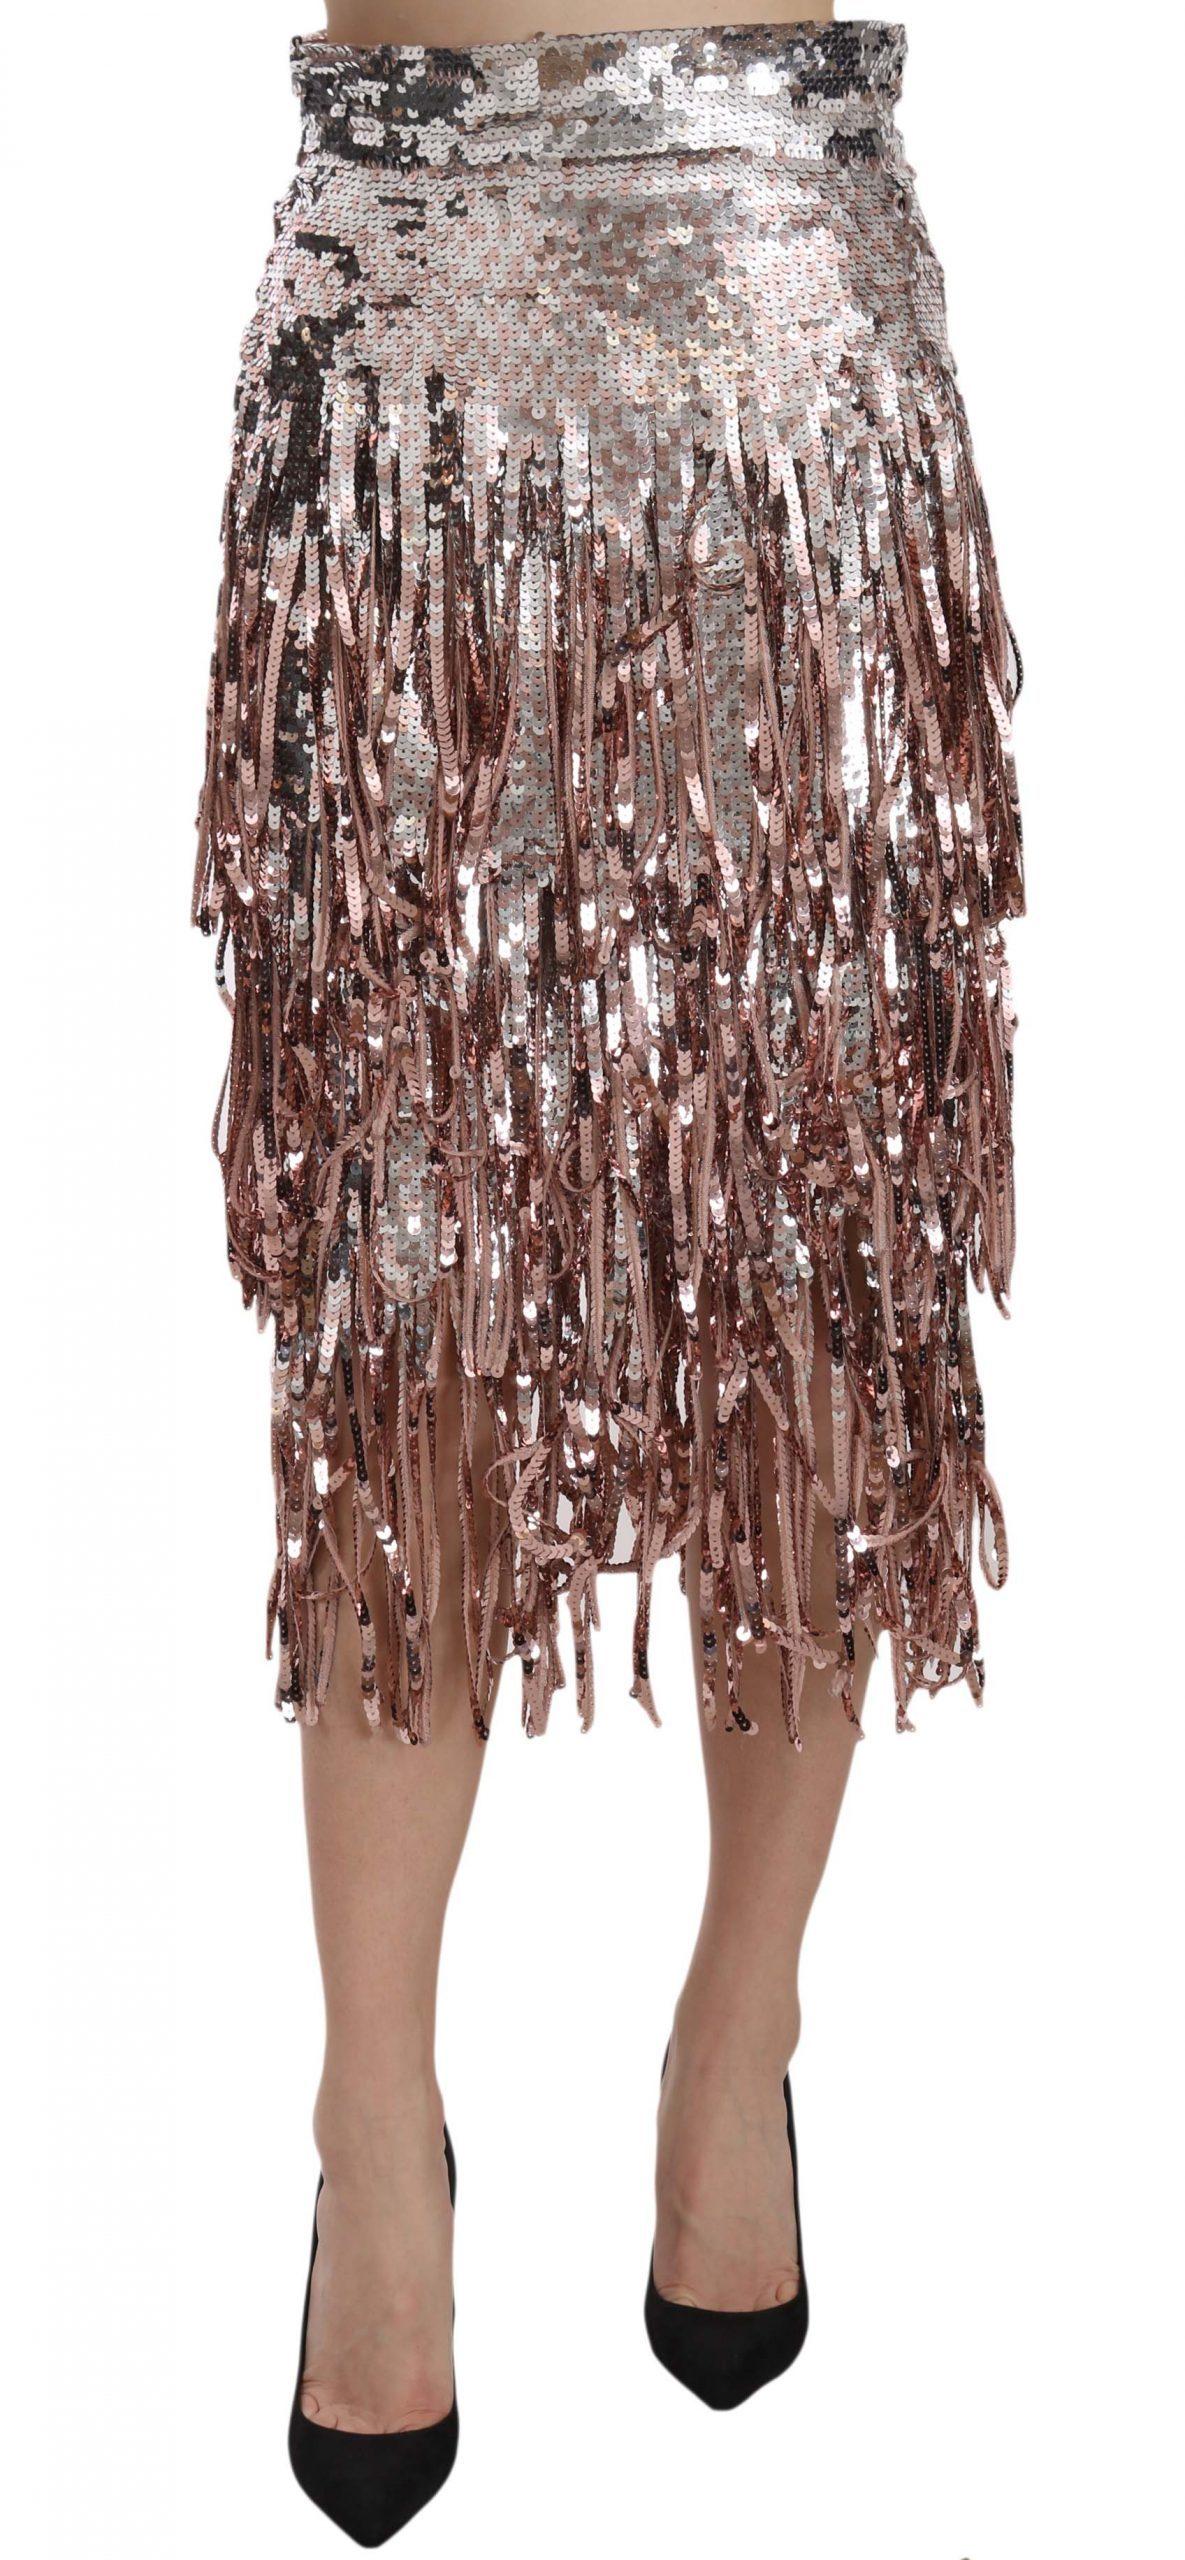 Dolce & Gabbana Women's Embellished Fringe Midi Pencil Skirt Silver SKI1173 - IT44 L